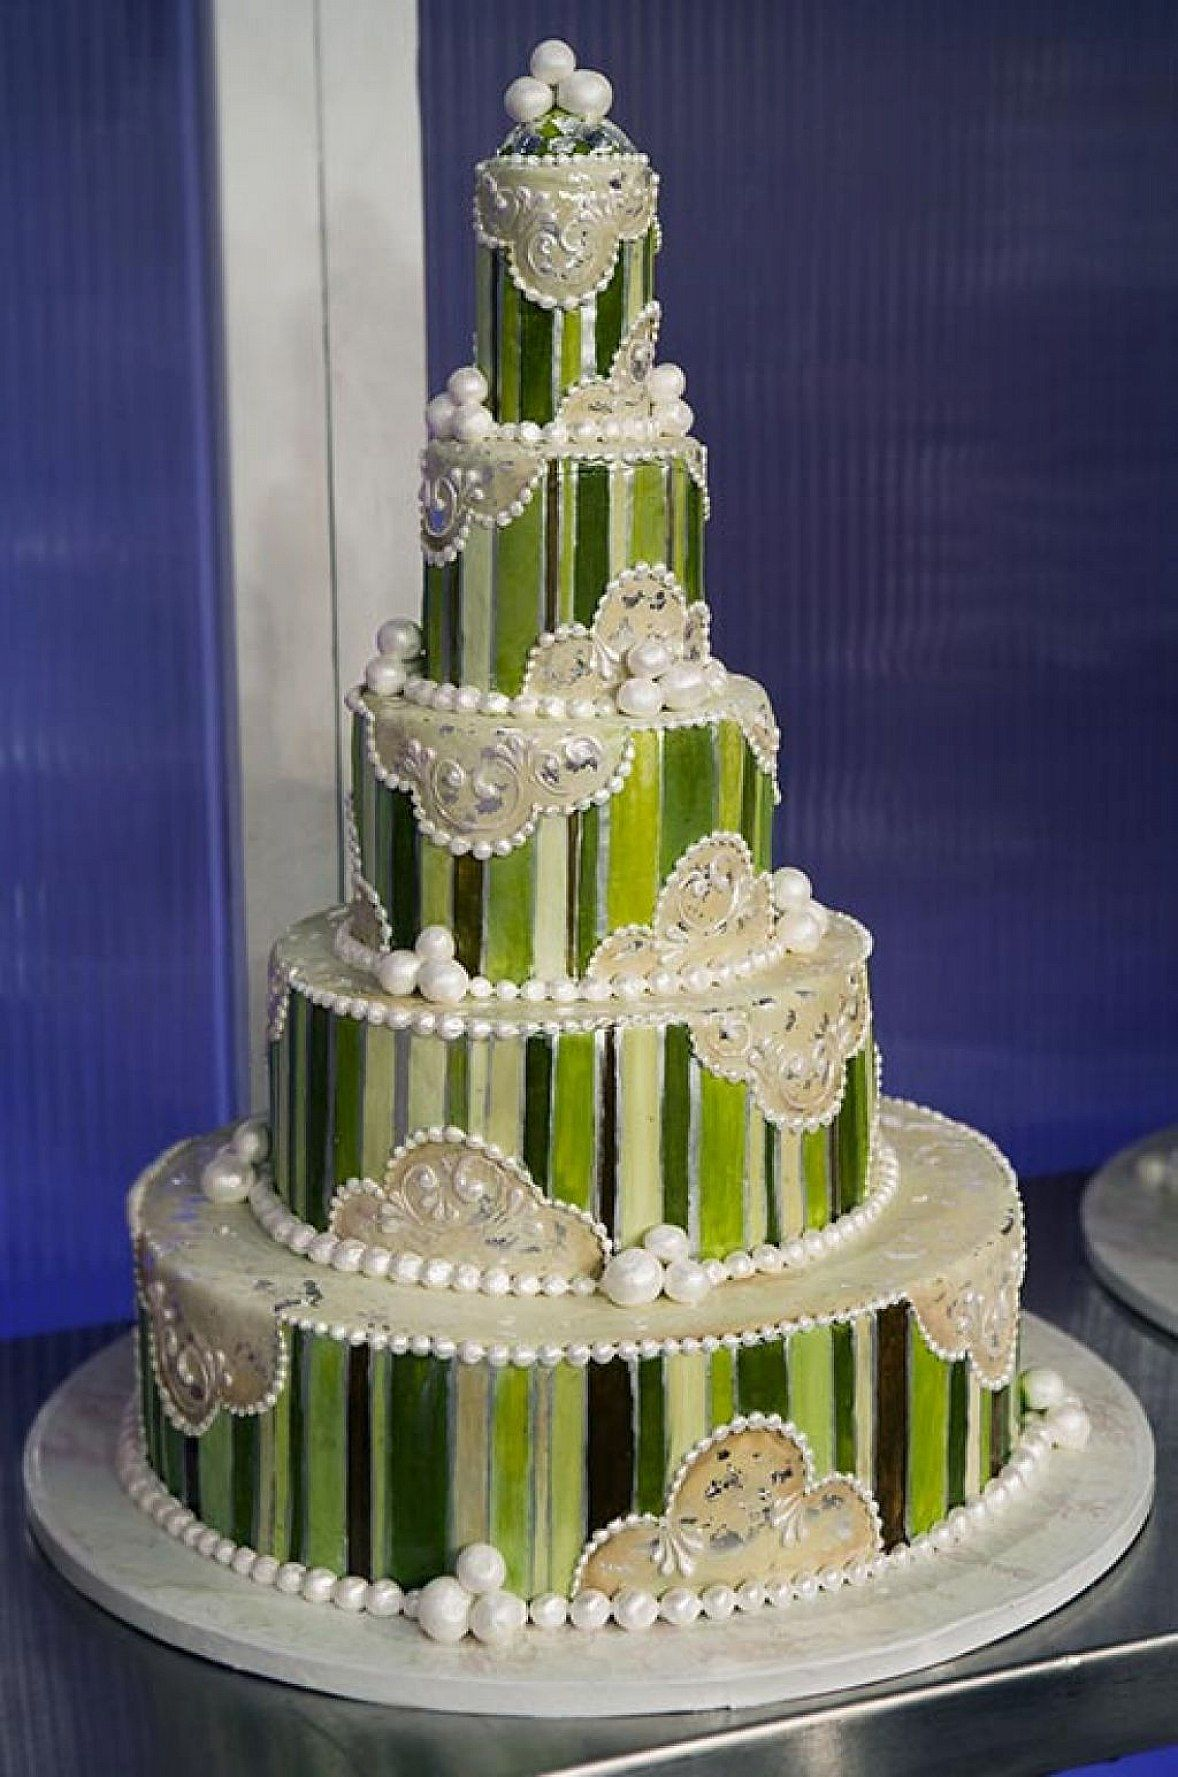 average cost for a wedding cake, wedding cake average cost